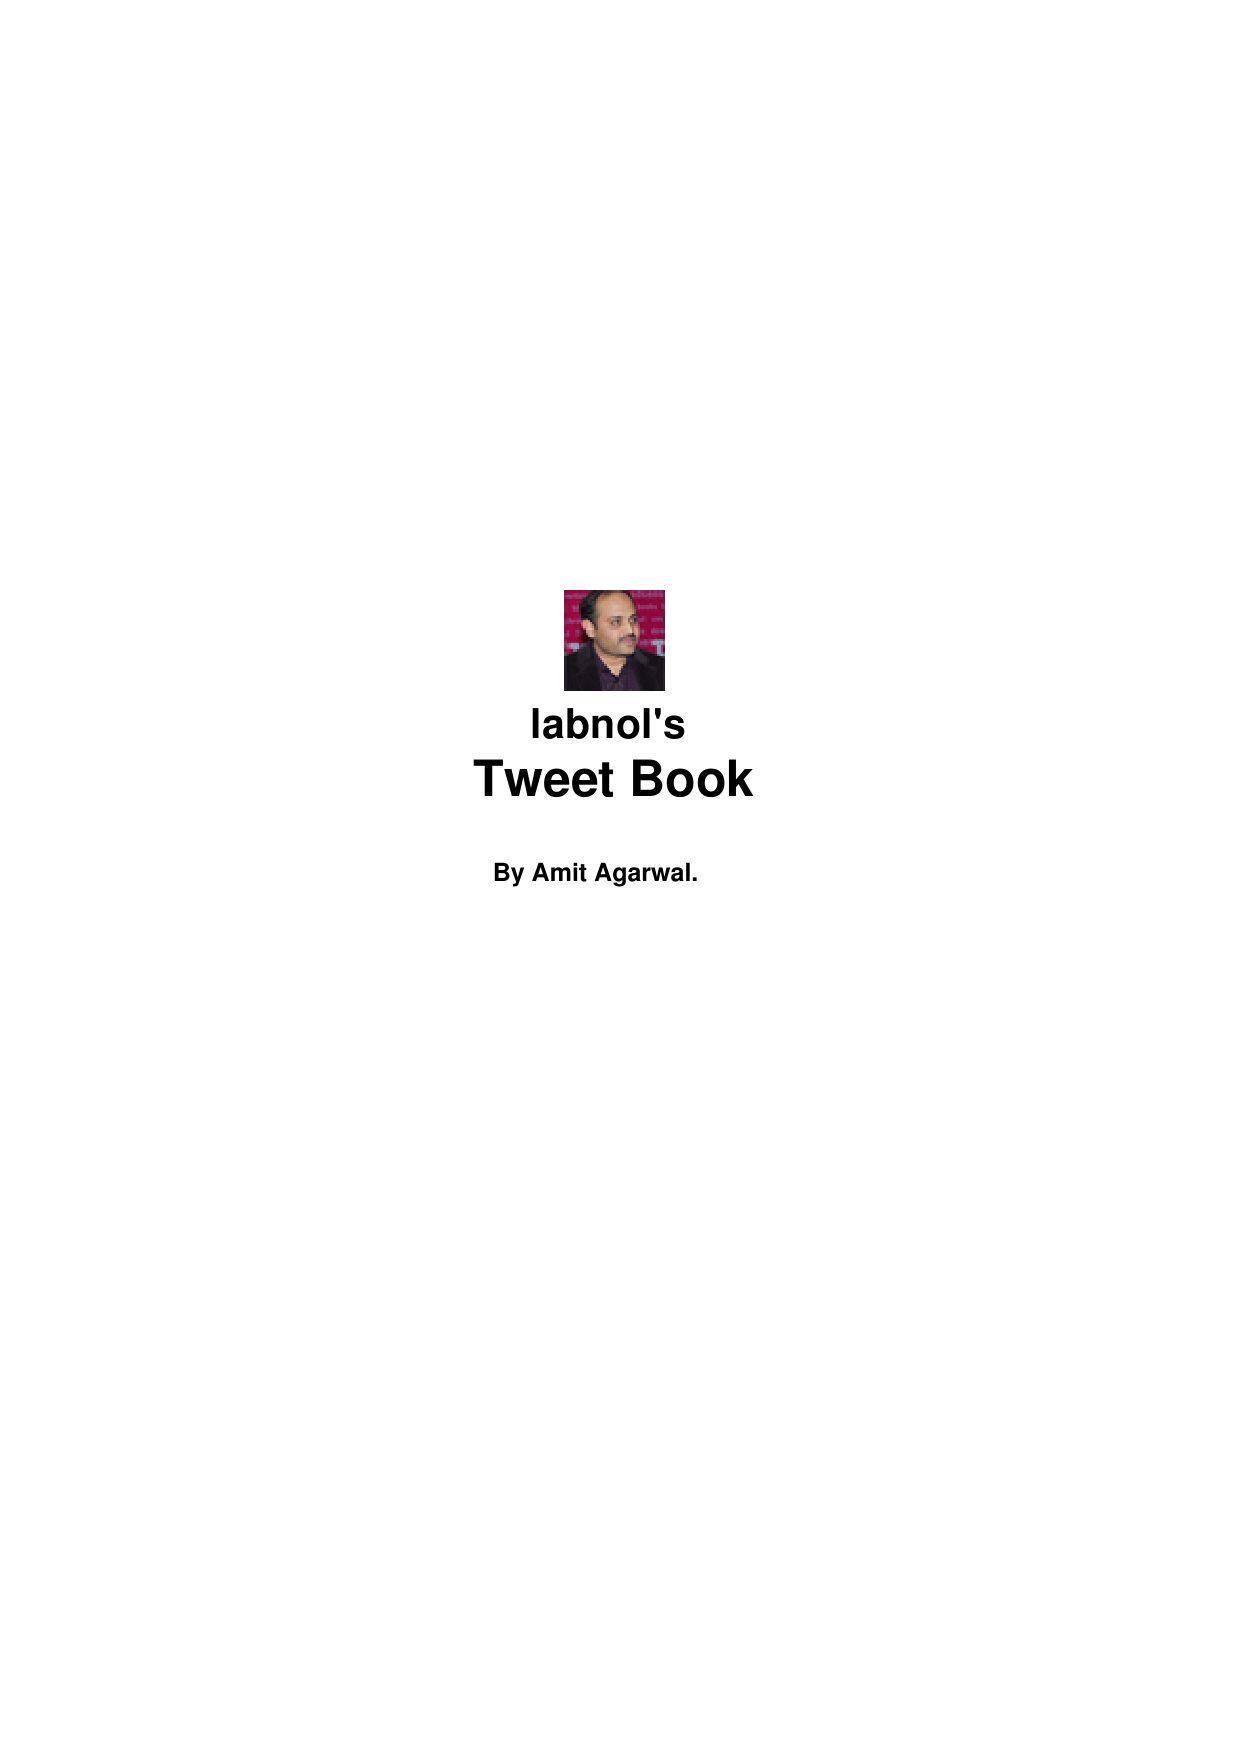 Labnol - Archive of Tweets